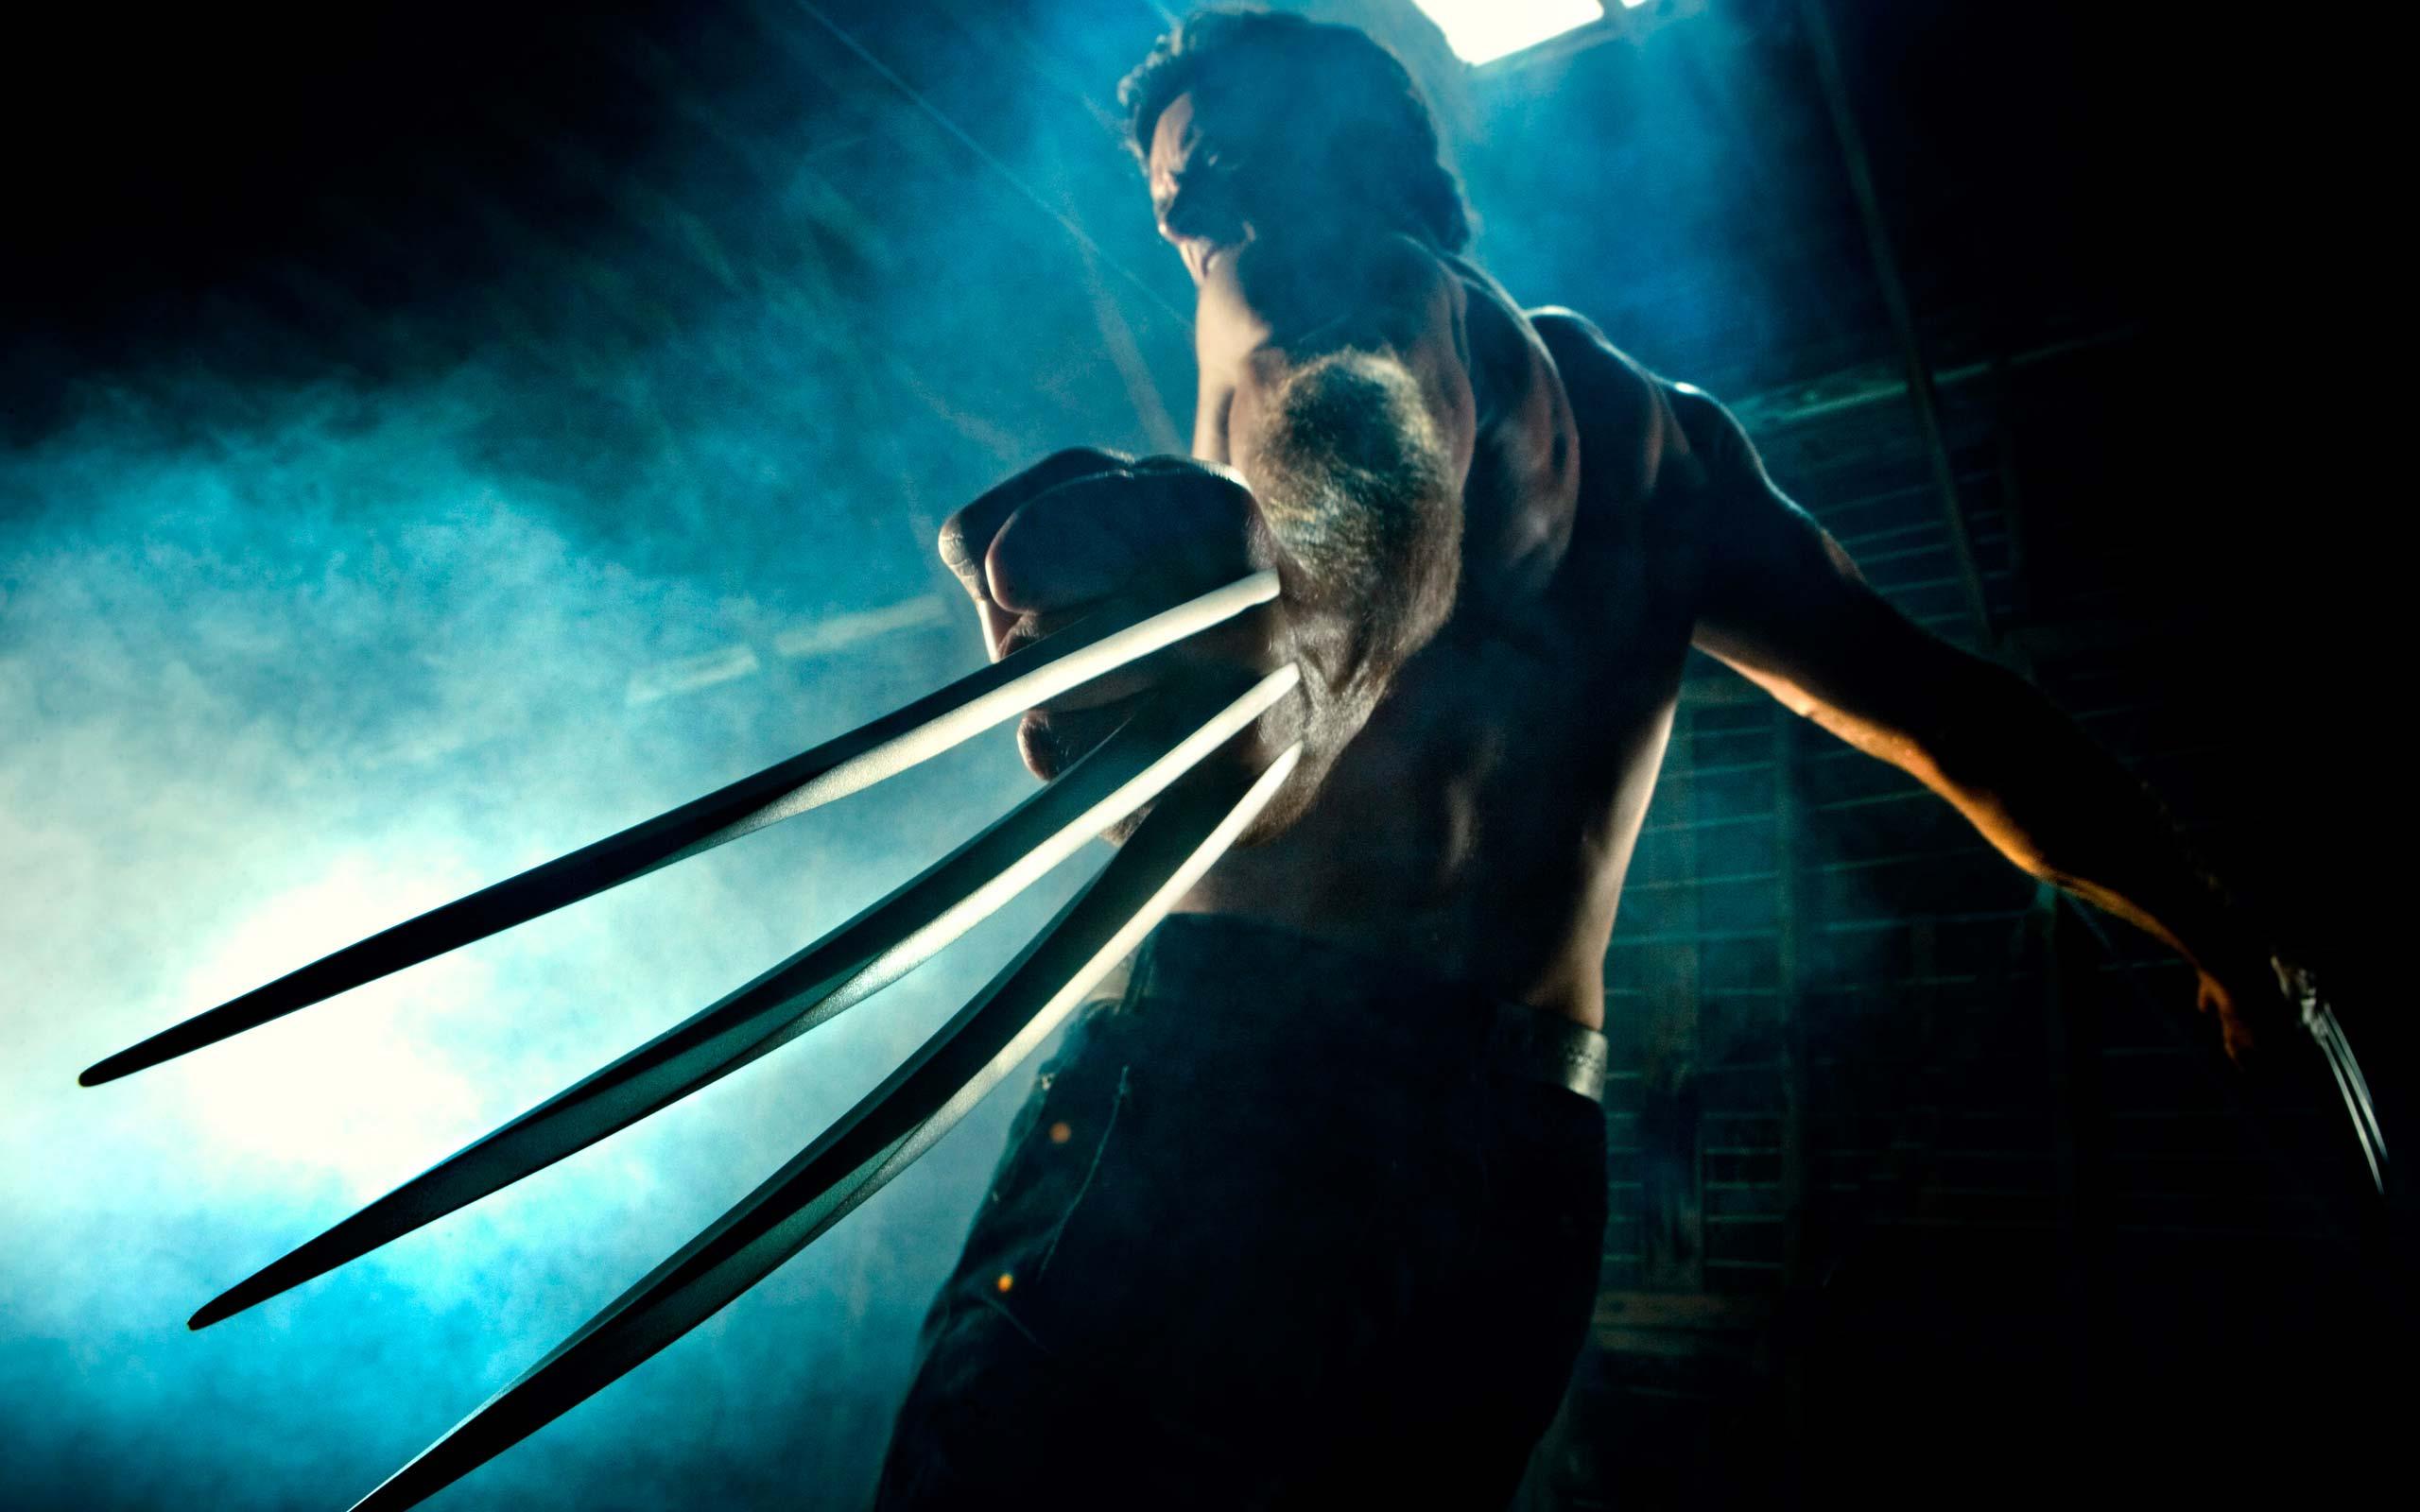 Hugh Jackman X Men Wolverine Wallpapers HD Collection 2560x1600